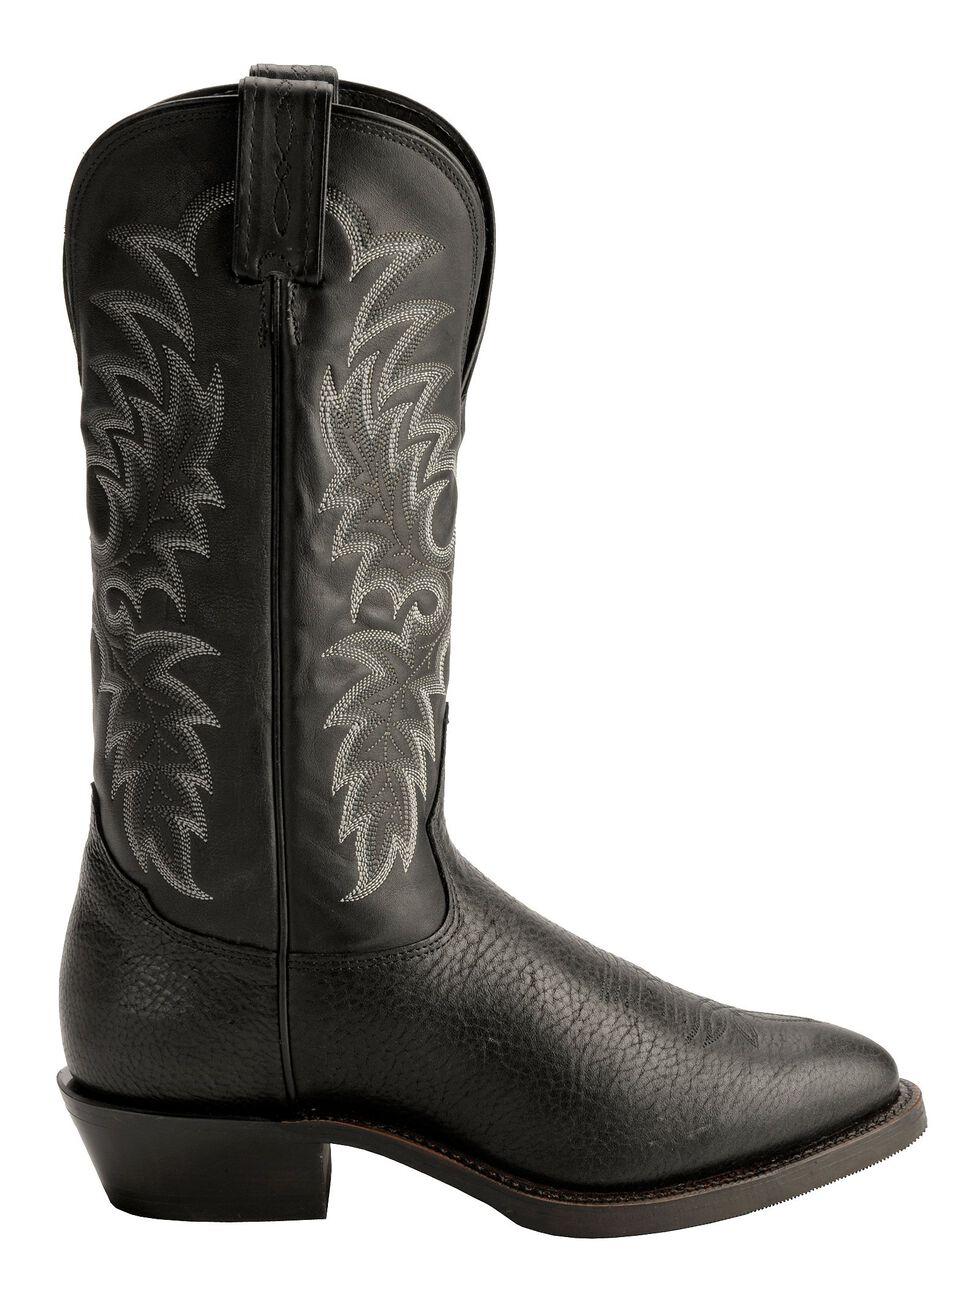 Tony Lama Americana Century Cowboy Boots, Black, hi-res